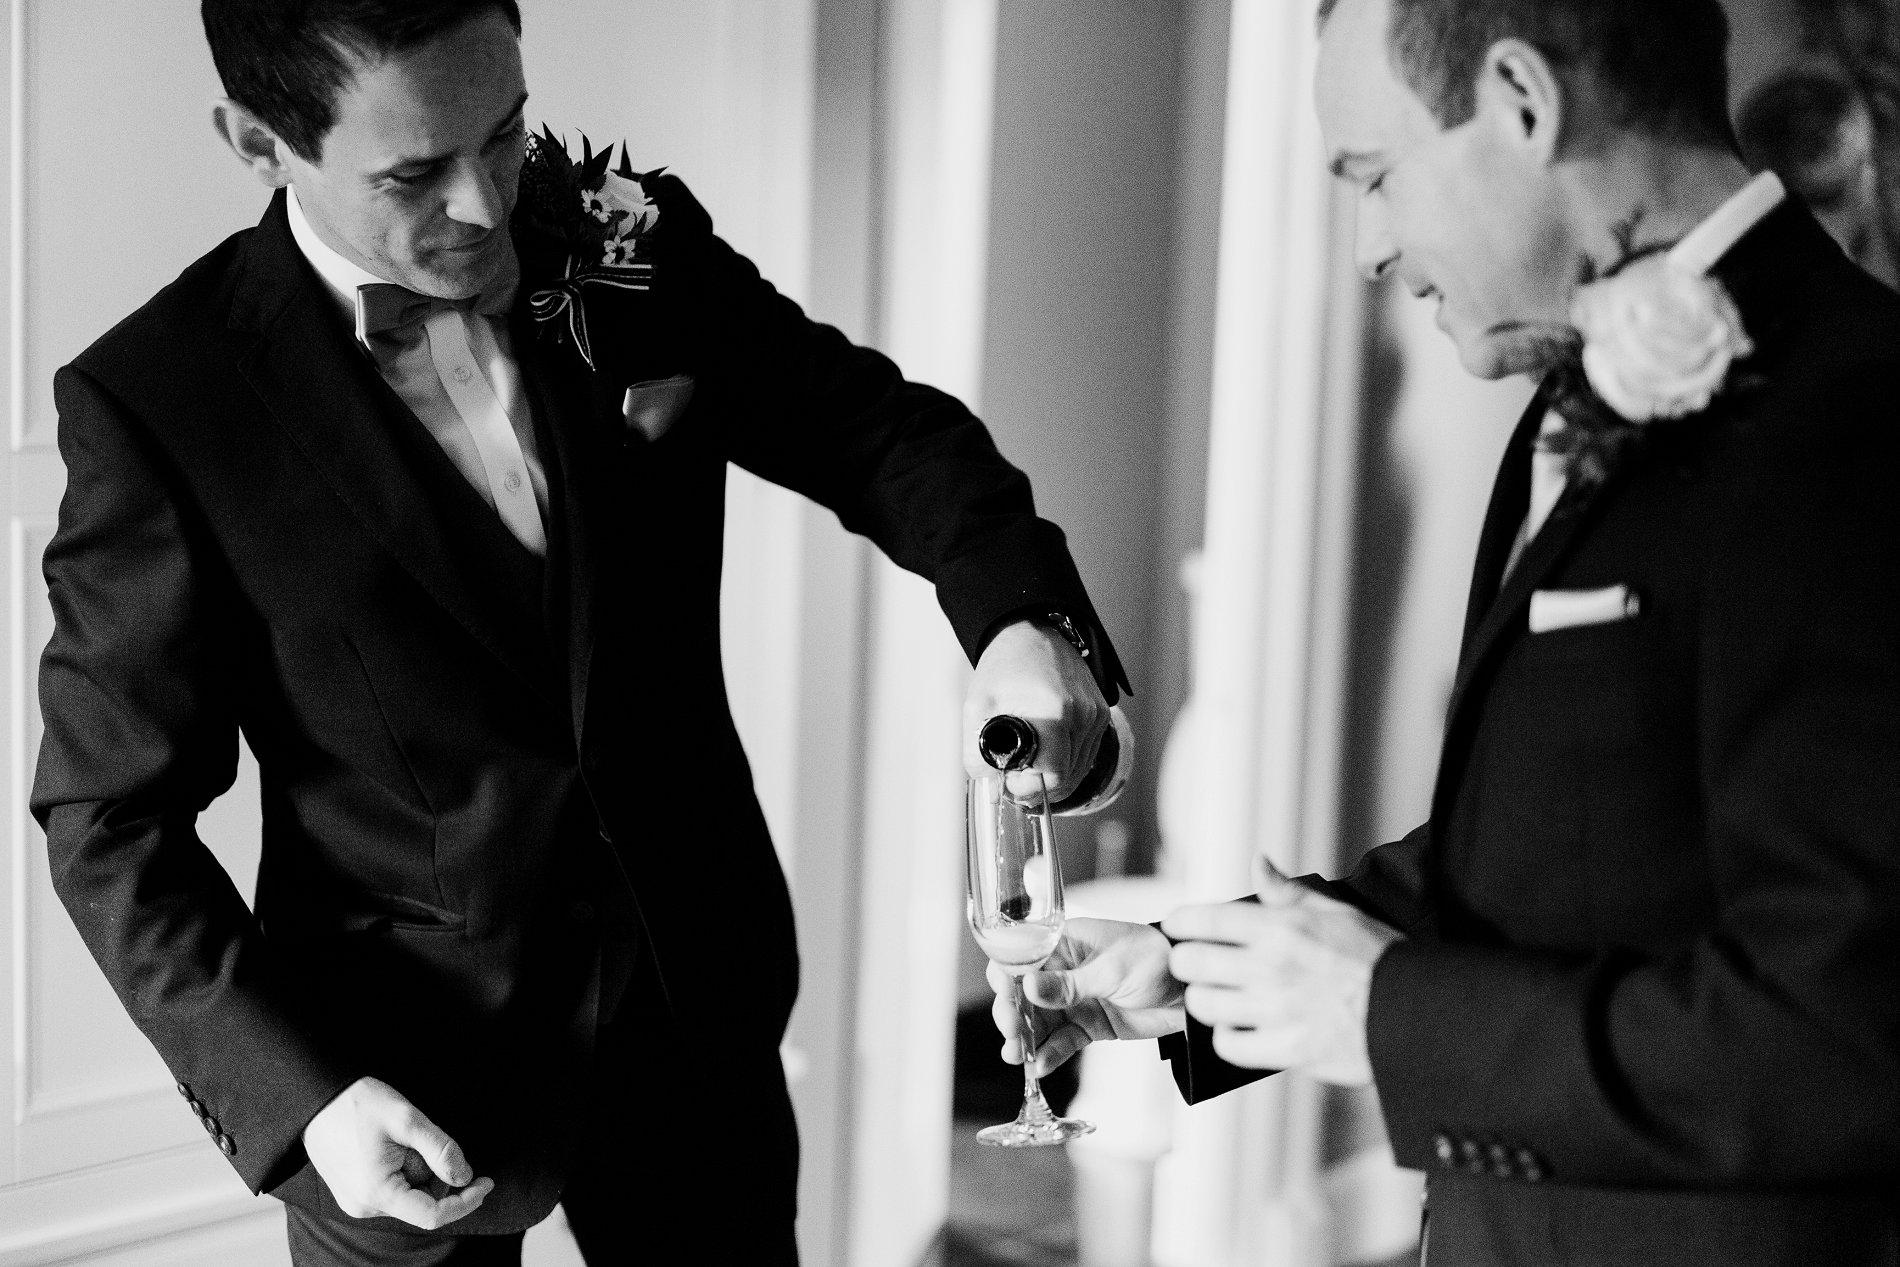 An Elegant White Wedding at Thicket Priory (c) Carla Whittingham Photography (10)